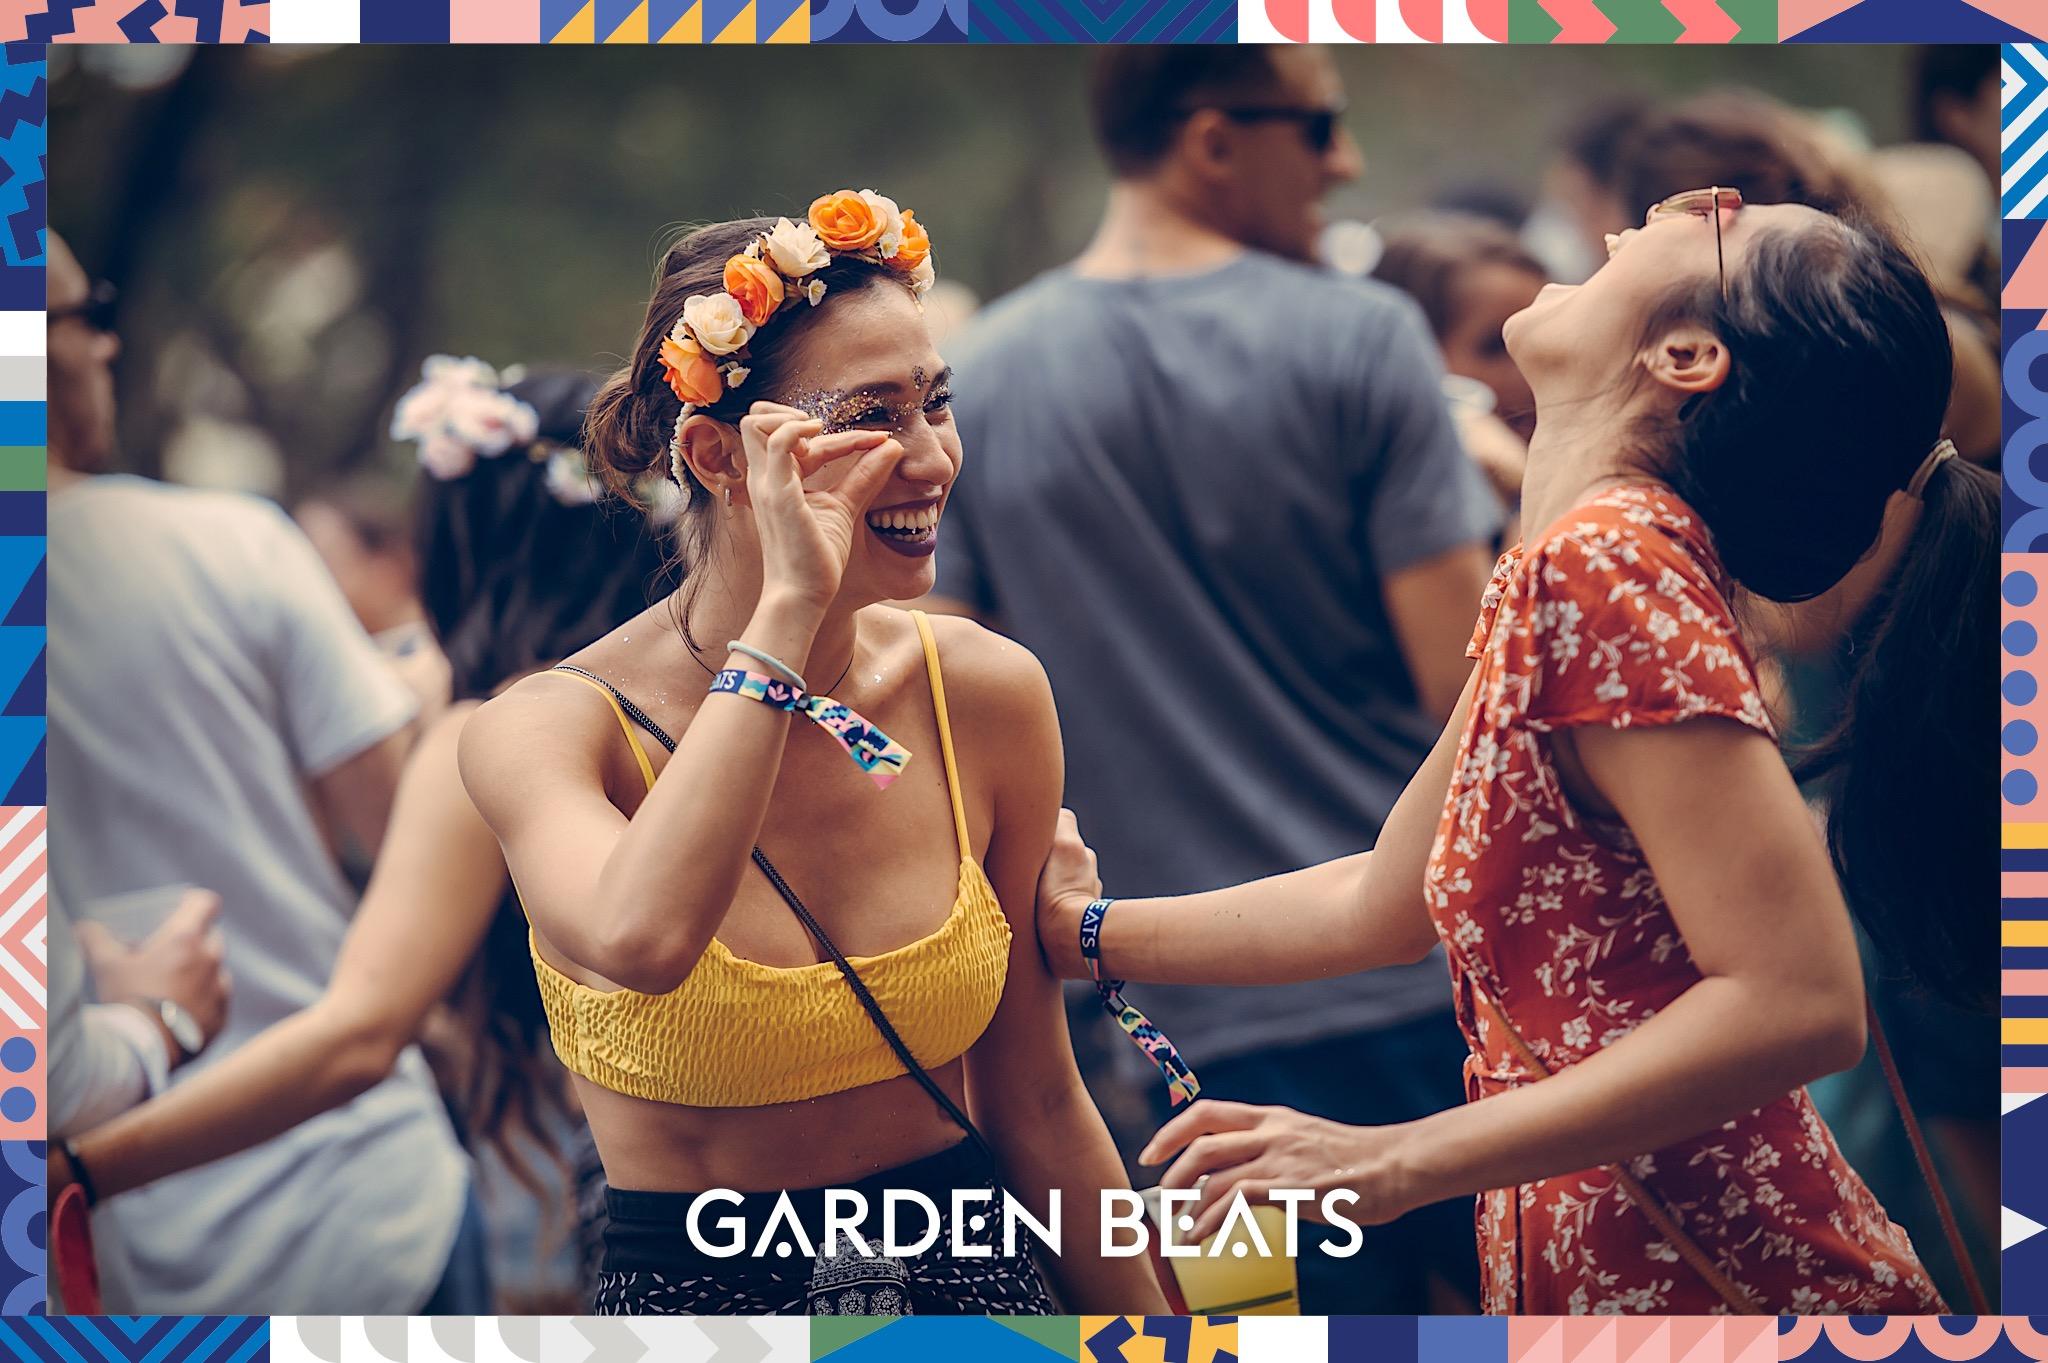 03032018_GardenBeats_Colossal565_Watermarked.jpg